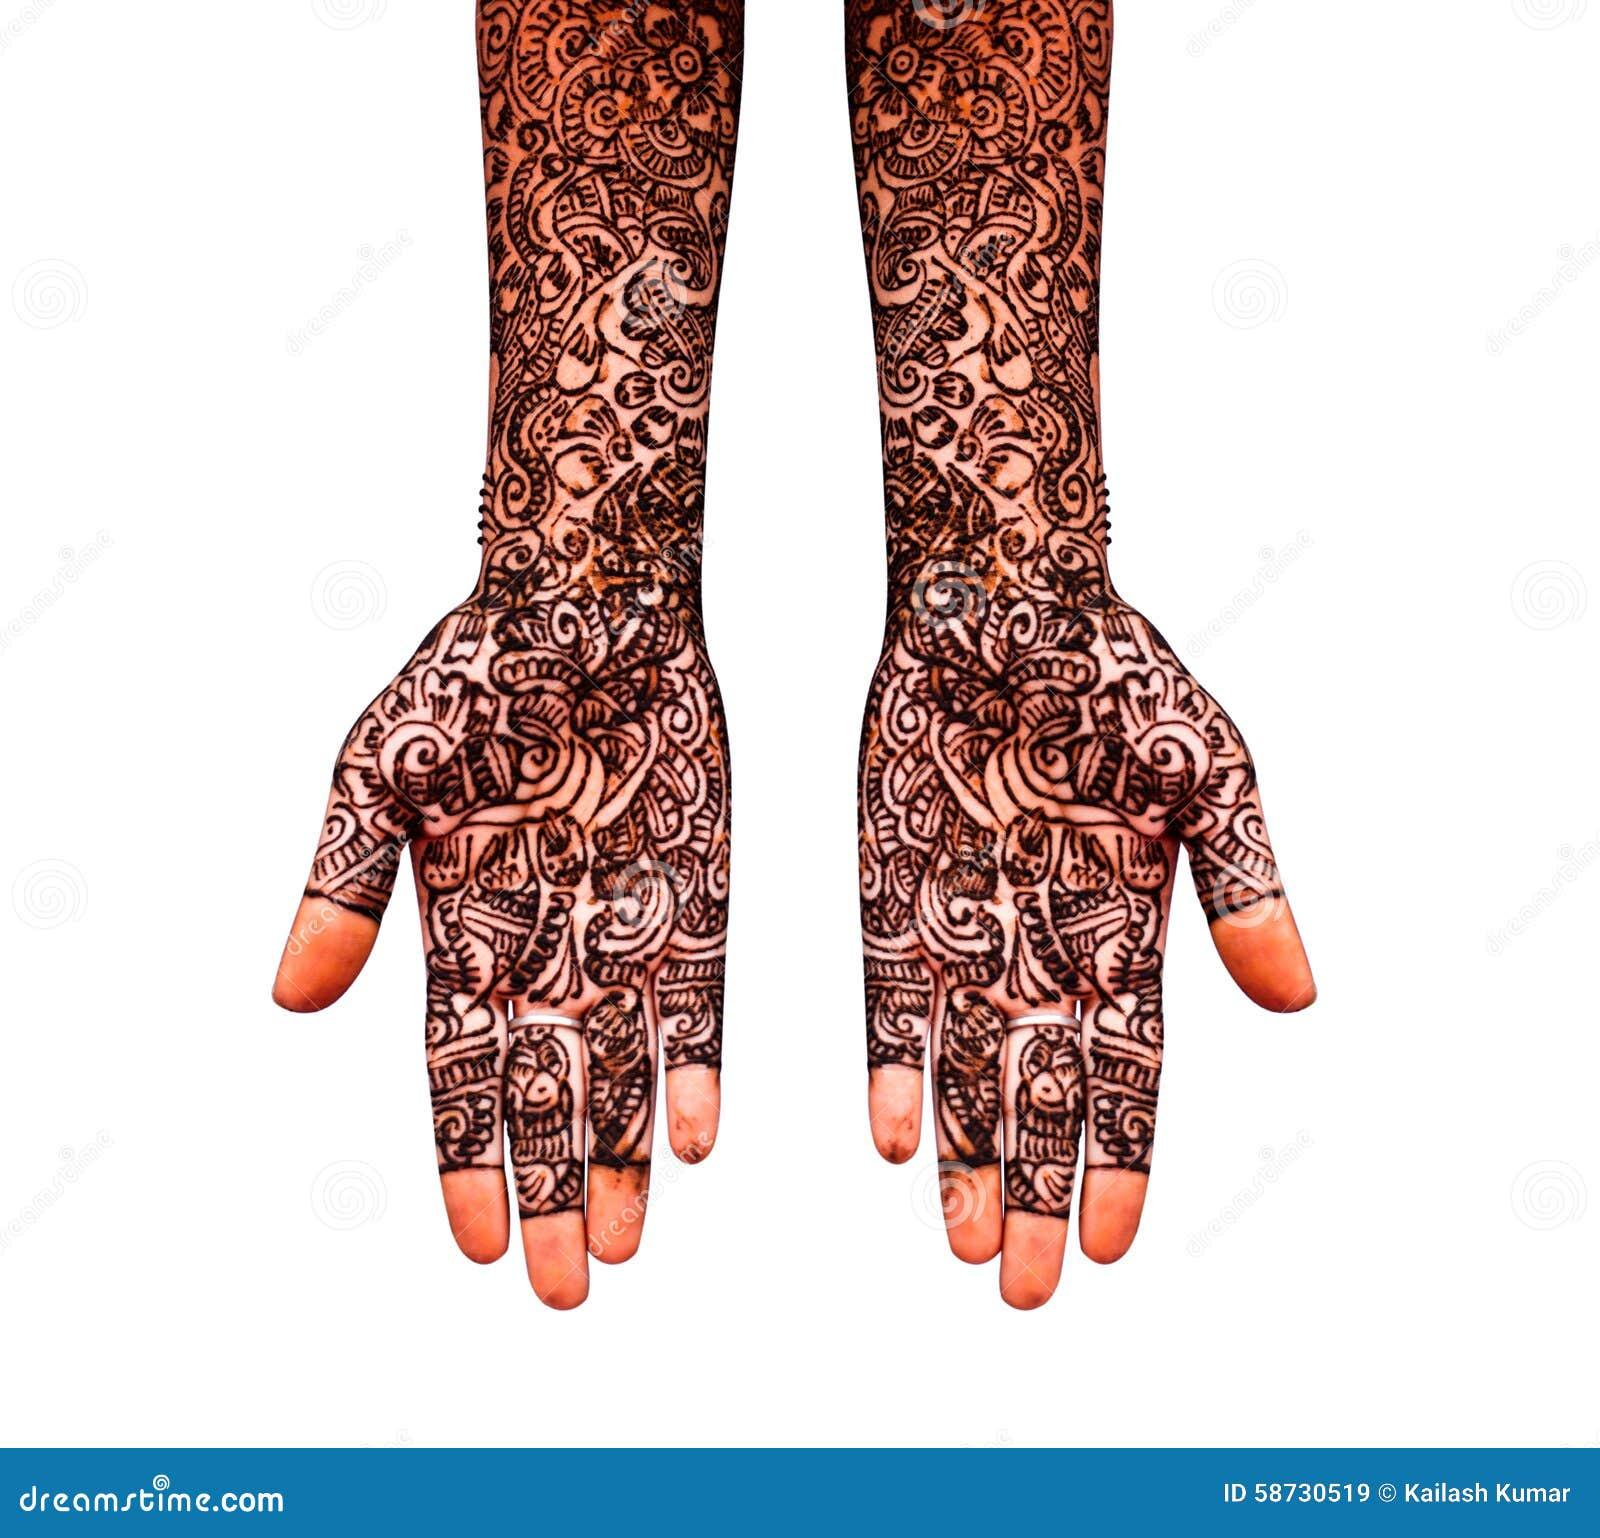 Henna Tattoo Imagen De Archivo Imagen De Union Novia 58730519